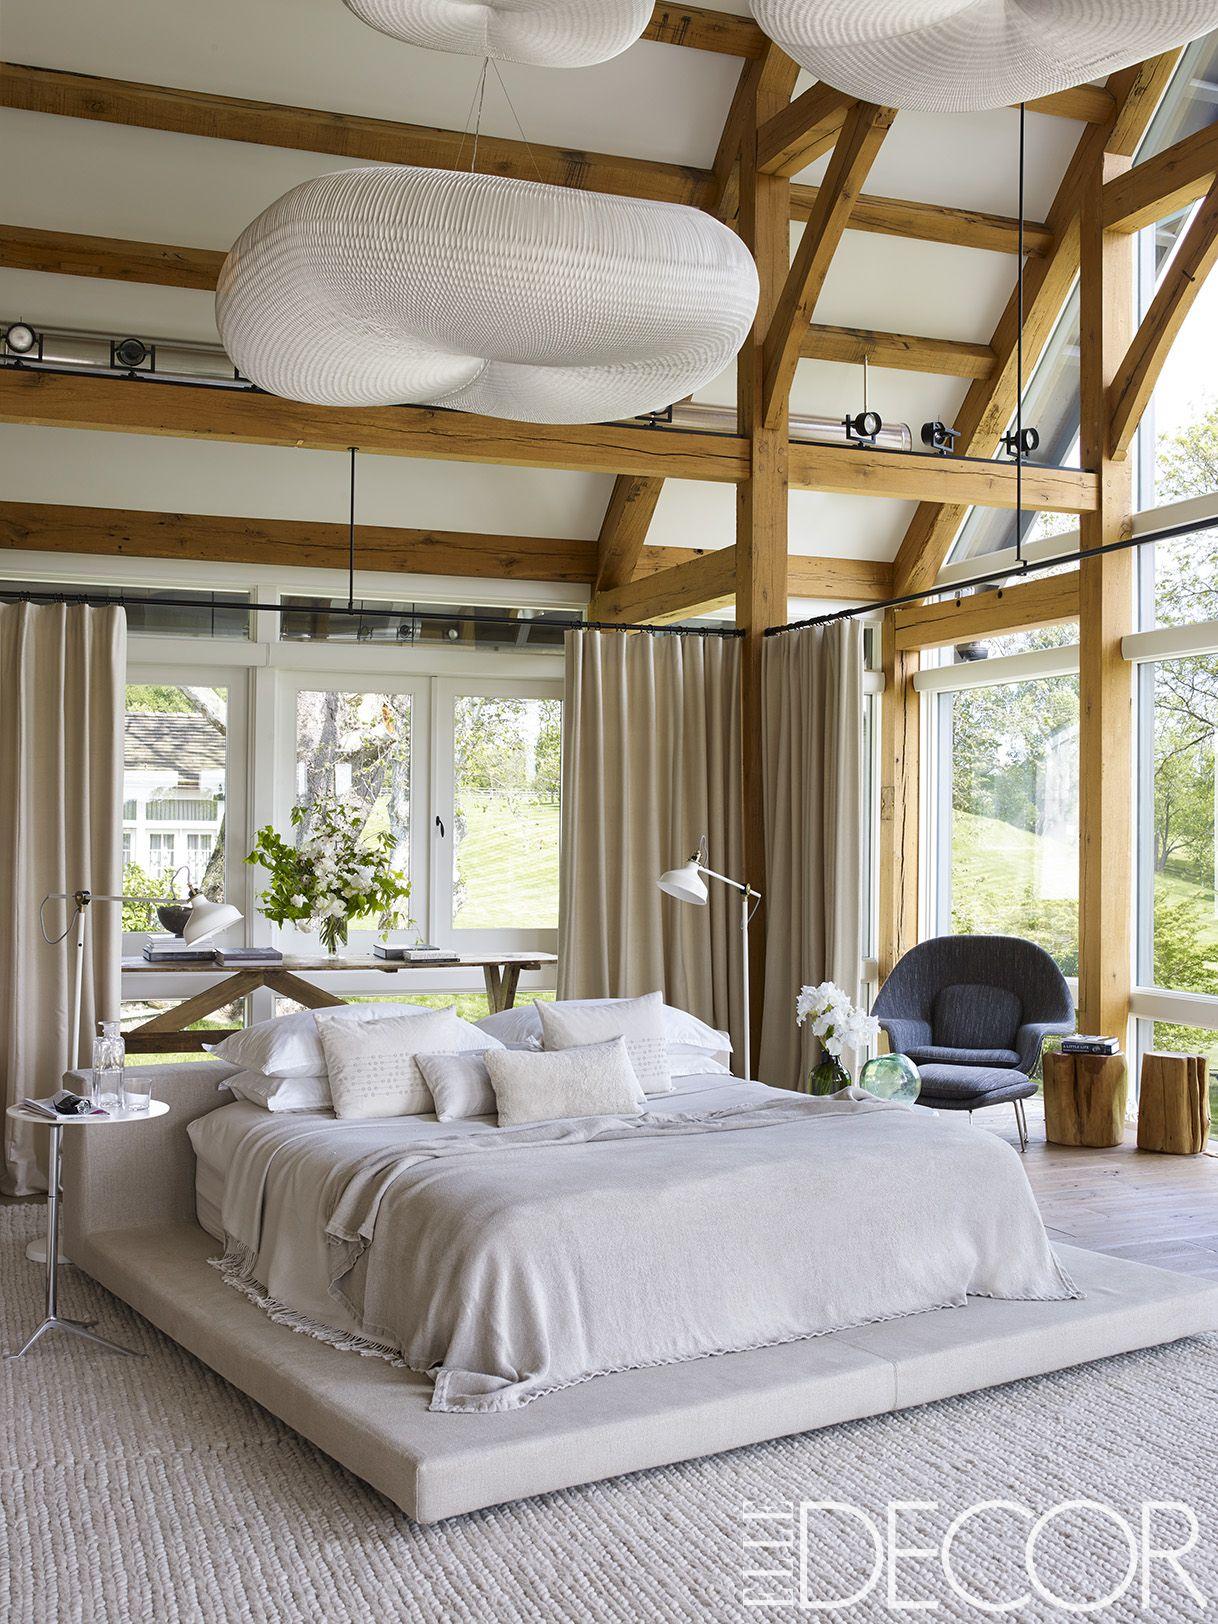 Creating an erotic bedroom